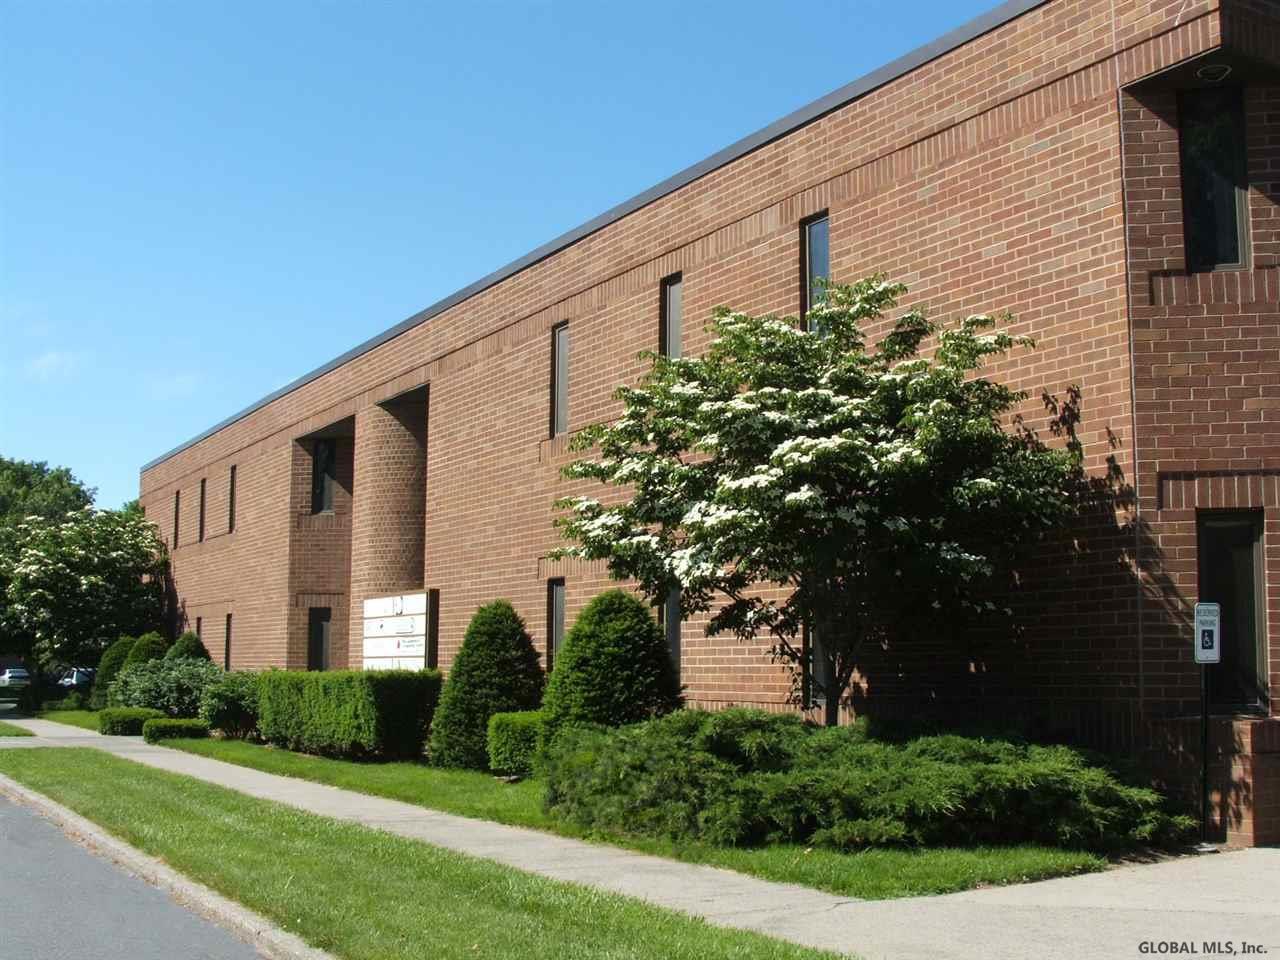 Albany image 1